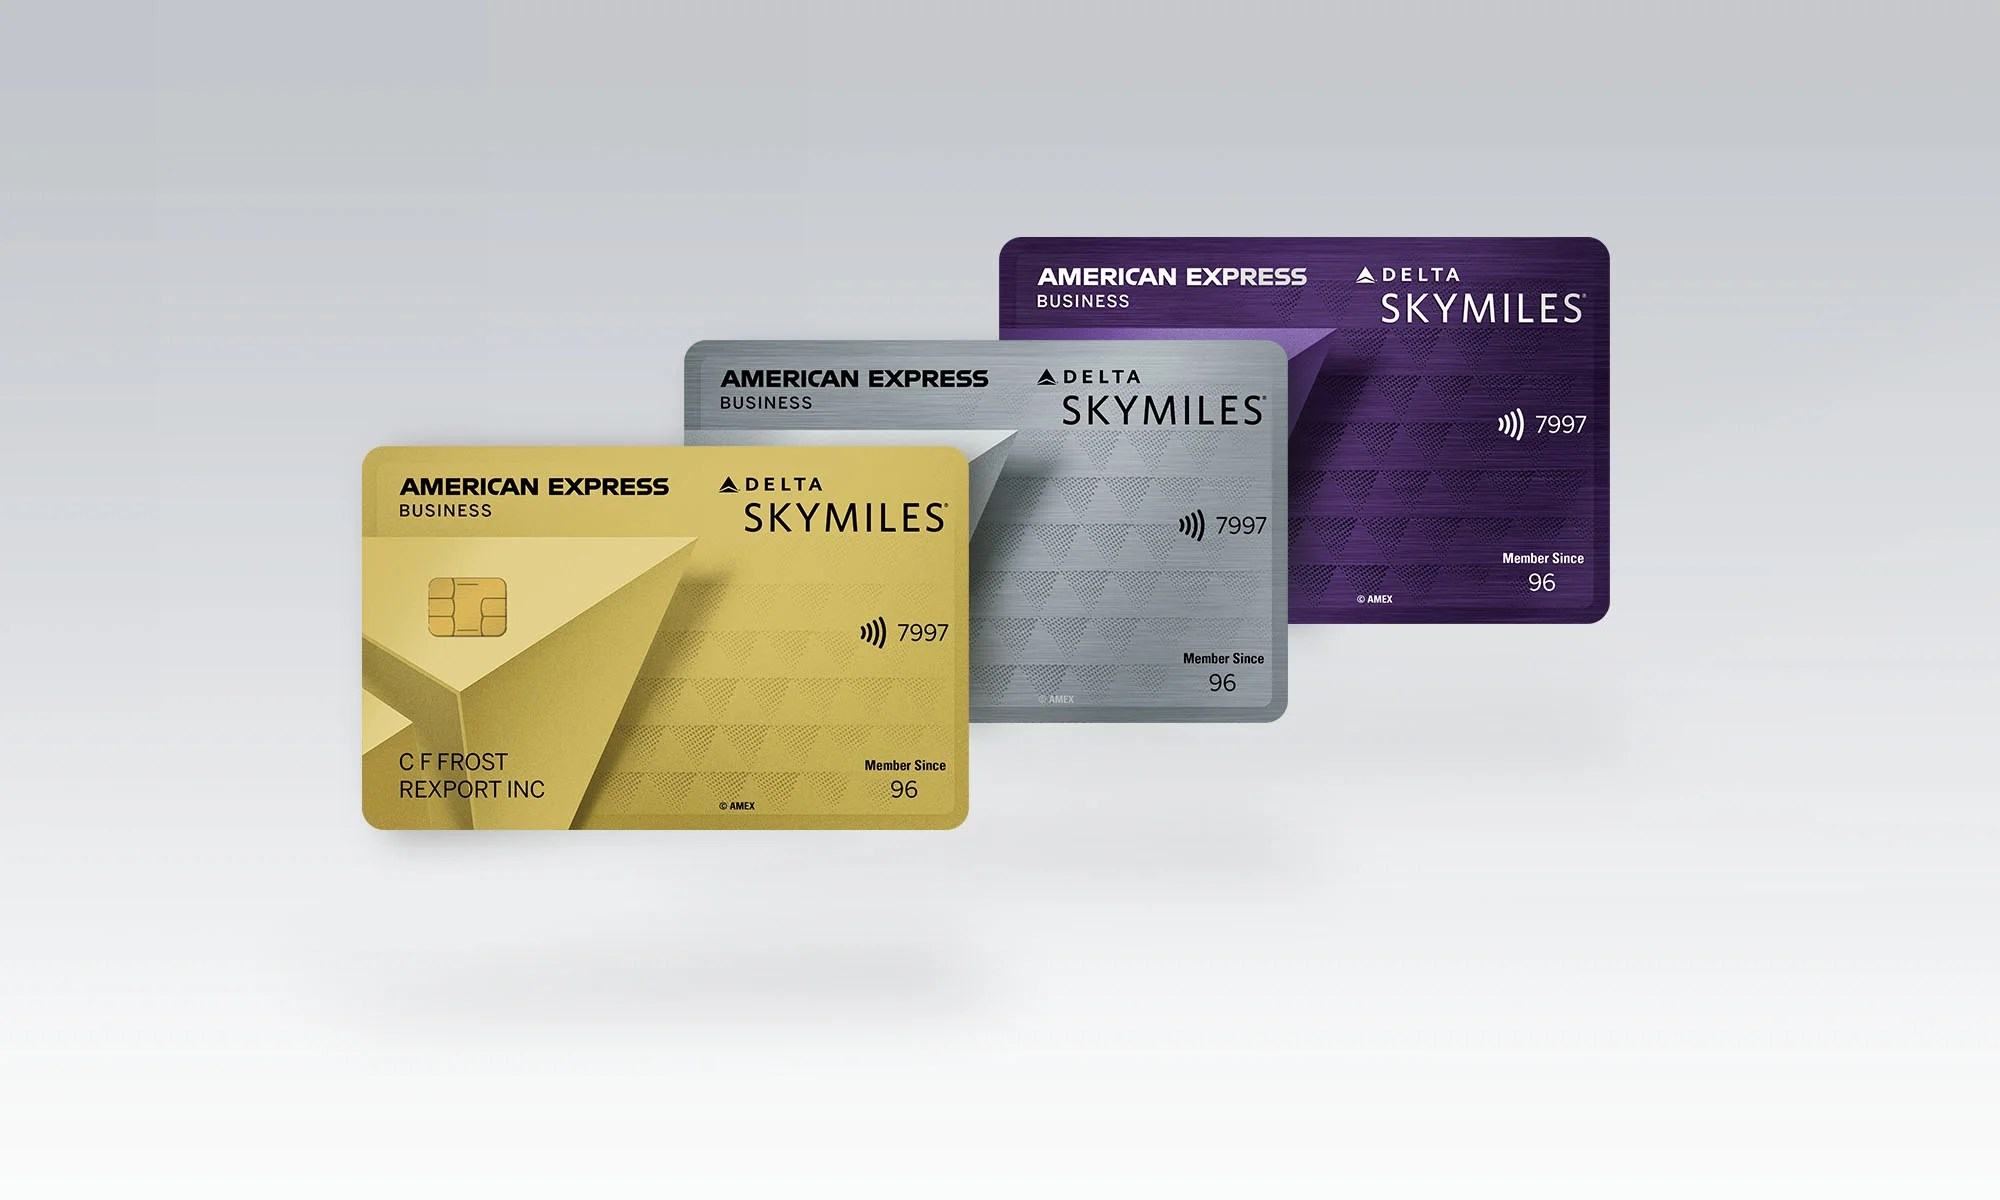 Targeted: 50k Amex Delta bonuses with no lifetime restriction